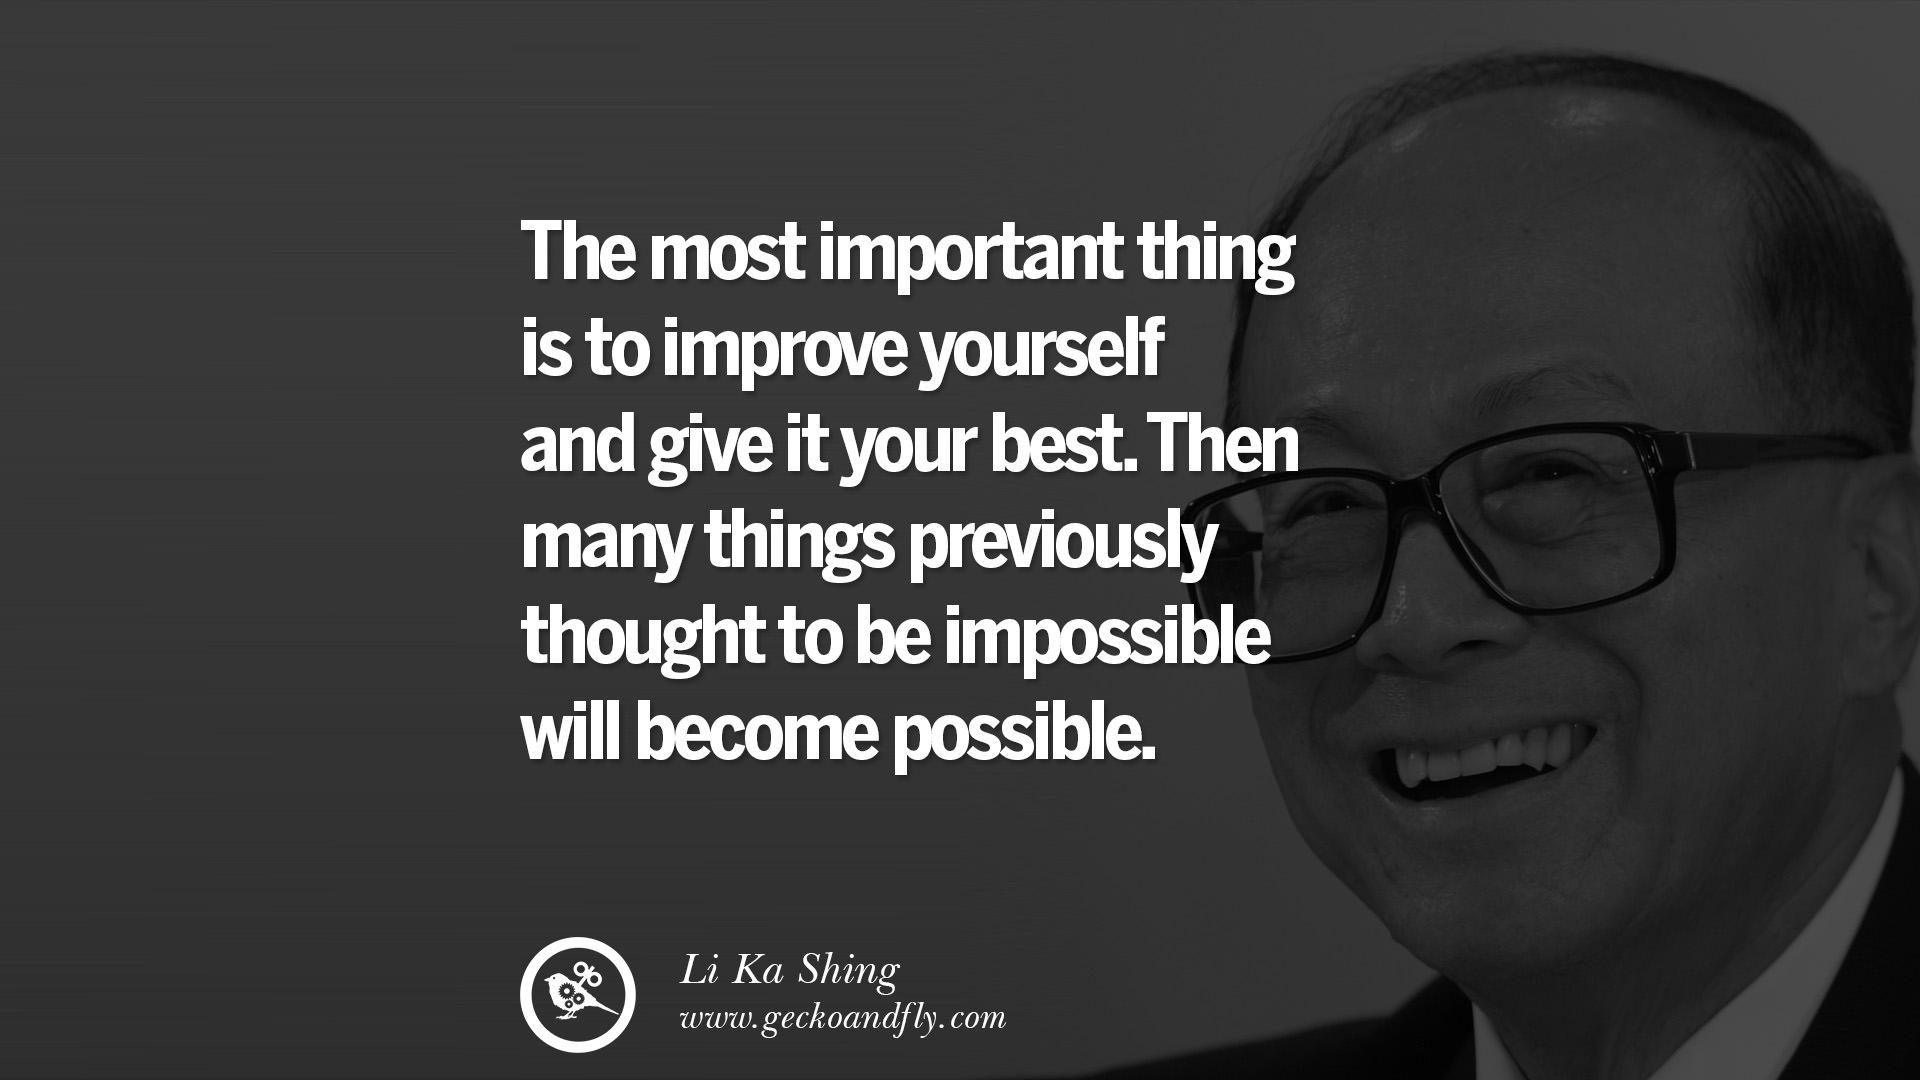 12 Inspiring Li Ka Shing Life Lessons And Business Quotes Geckoandfly 2018